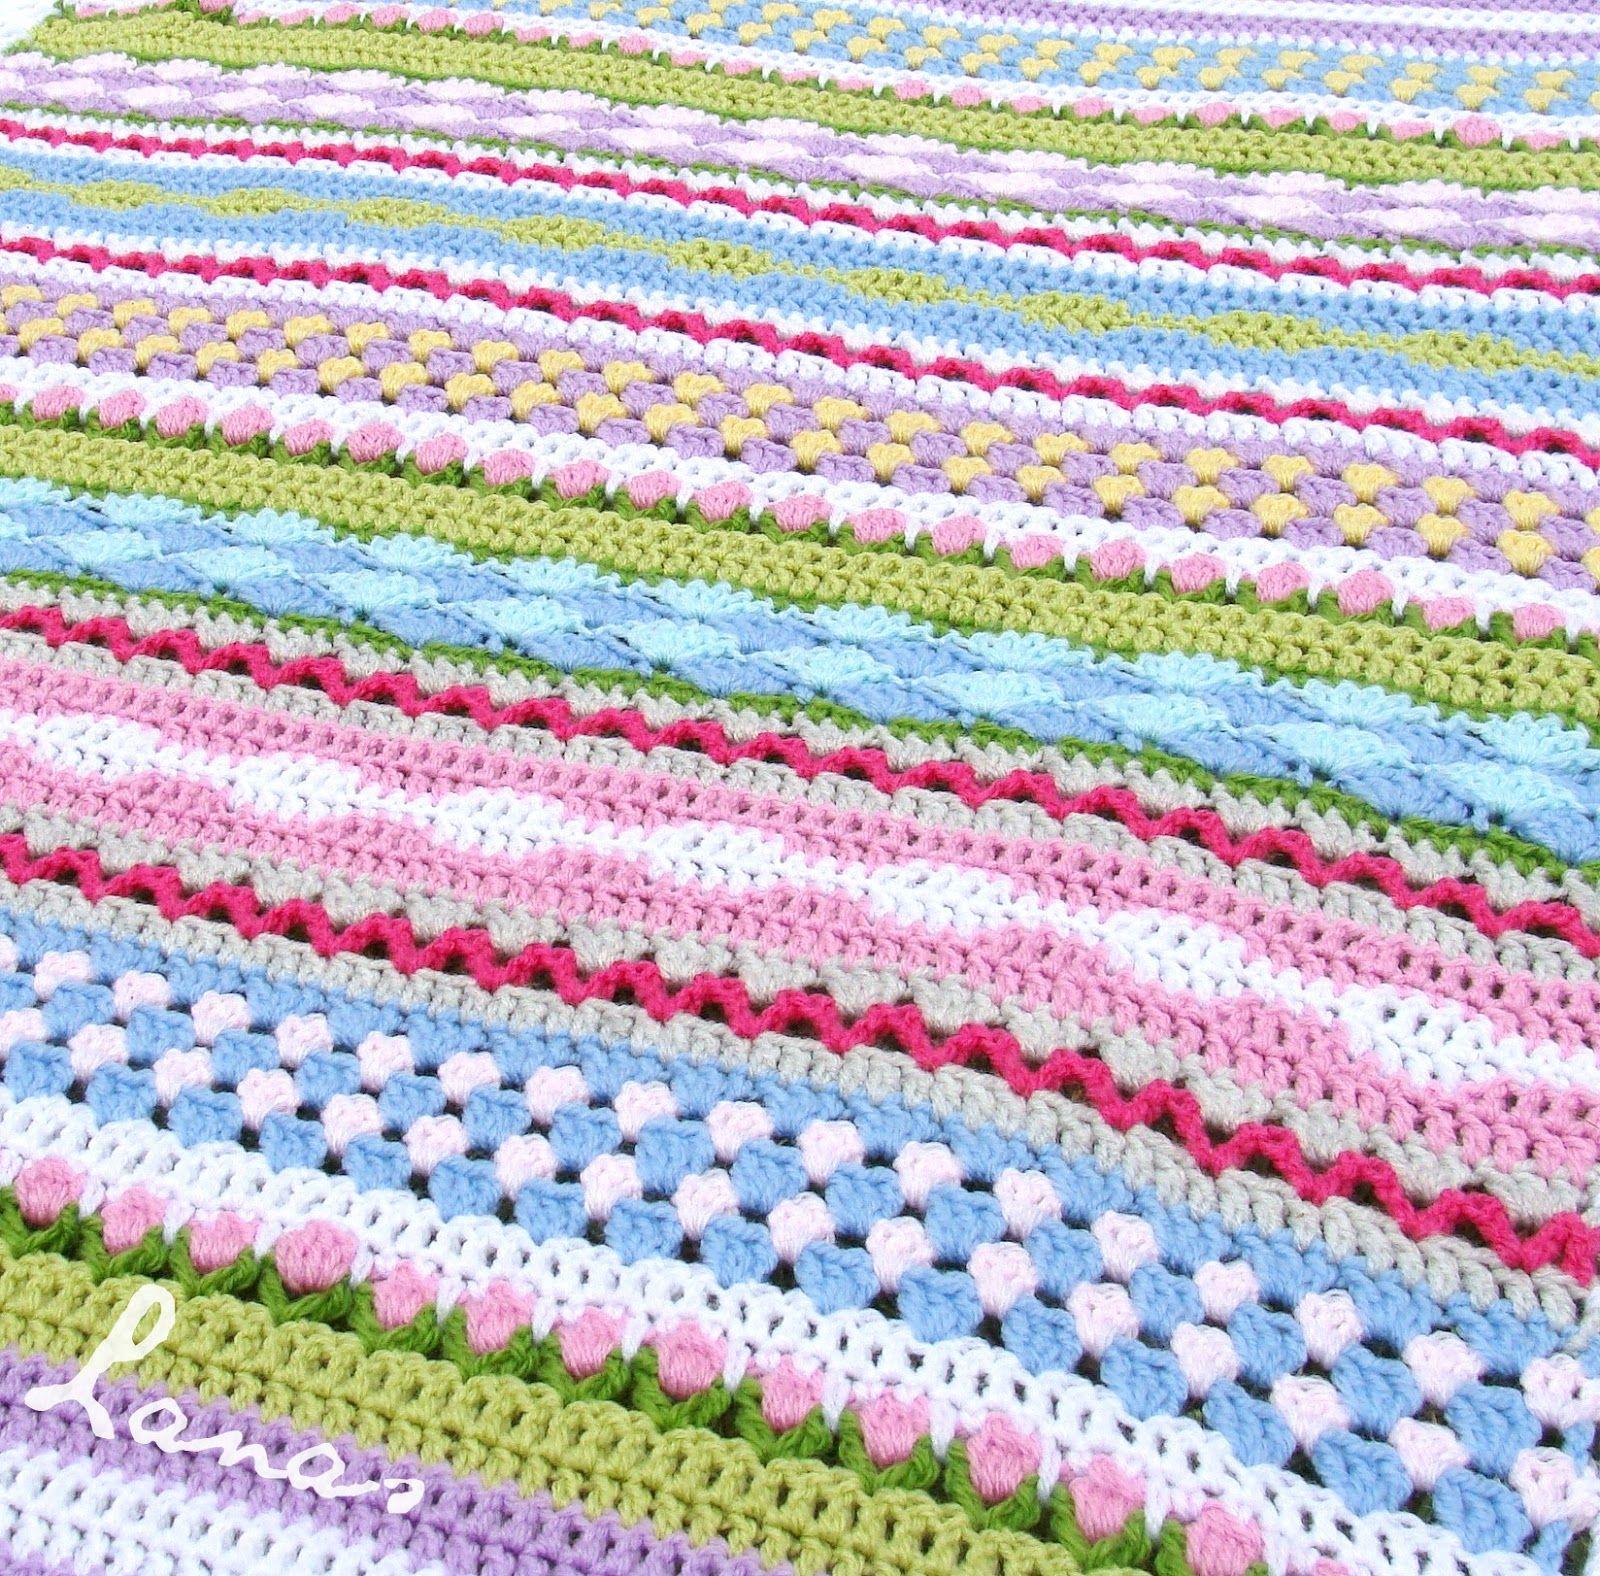 Lanas de Ana: Fantasy Blanket: Construction (VII) | Knitting ...